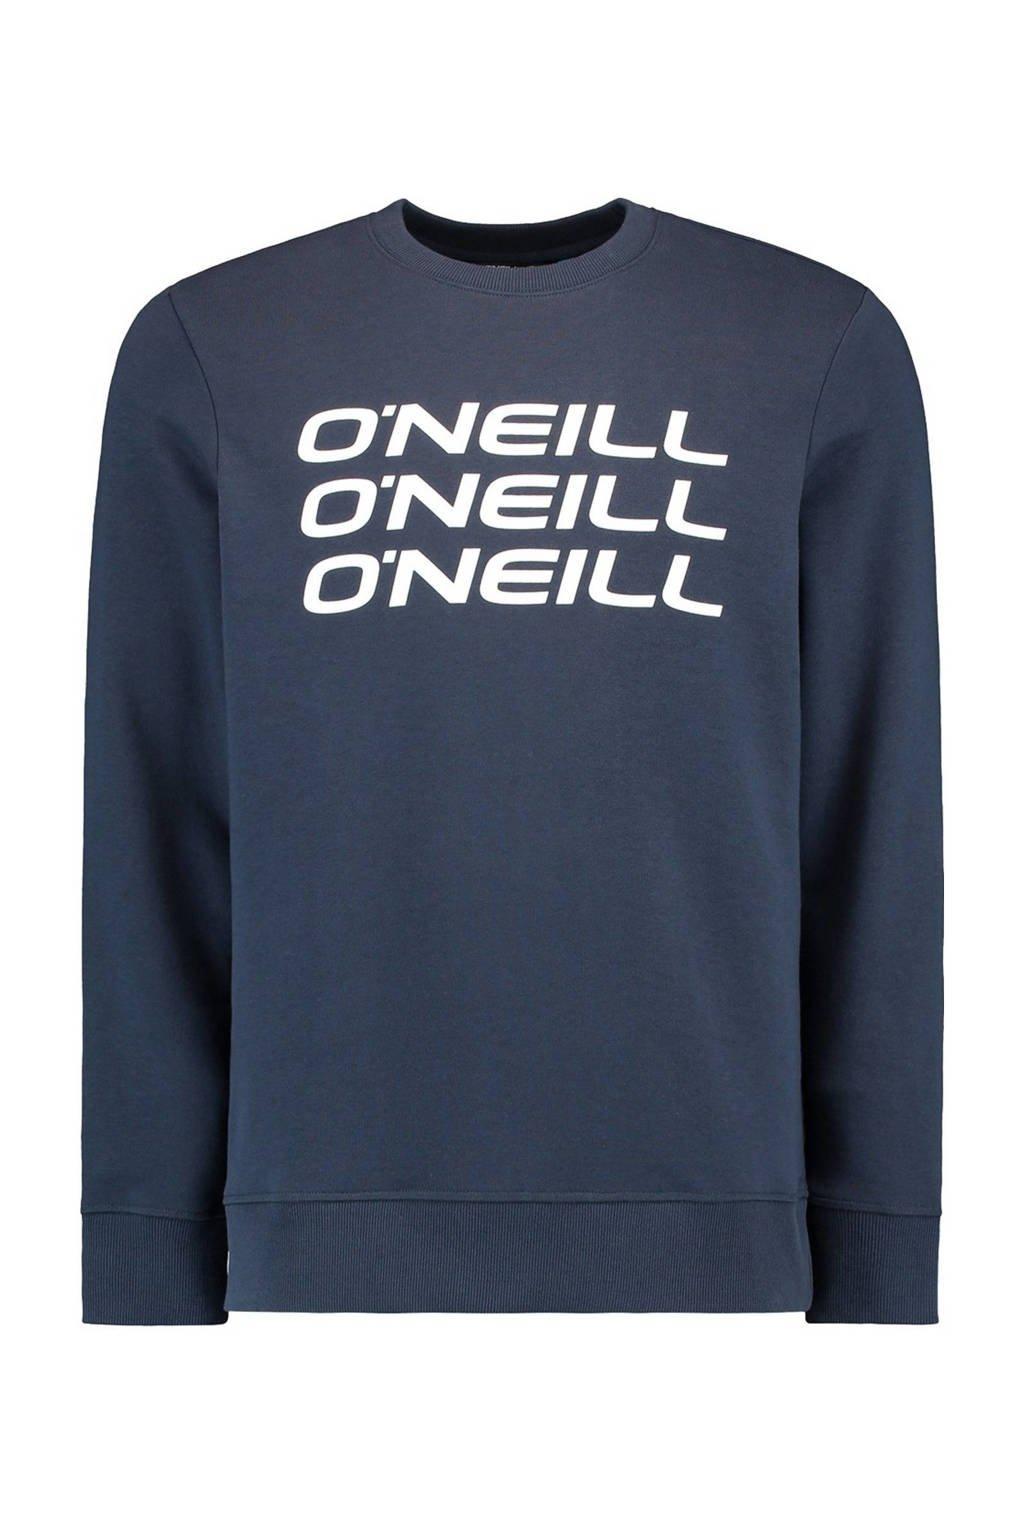 O'Neill longsleeve donkerblauw, Donkerblauw